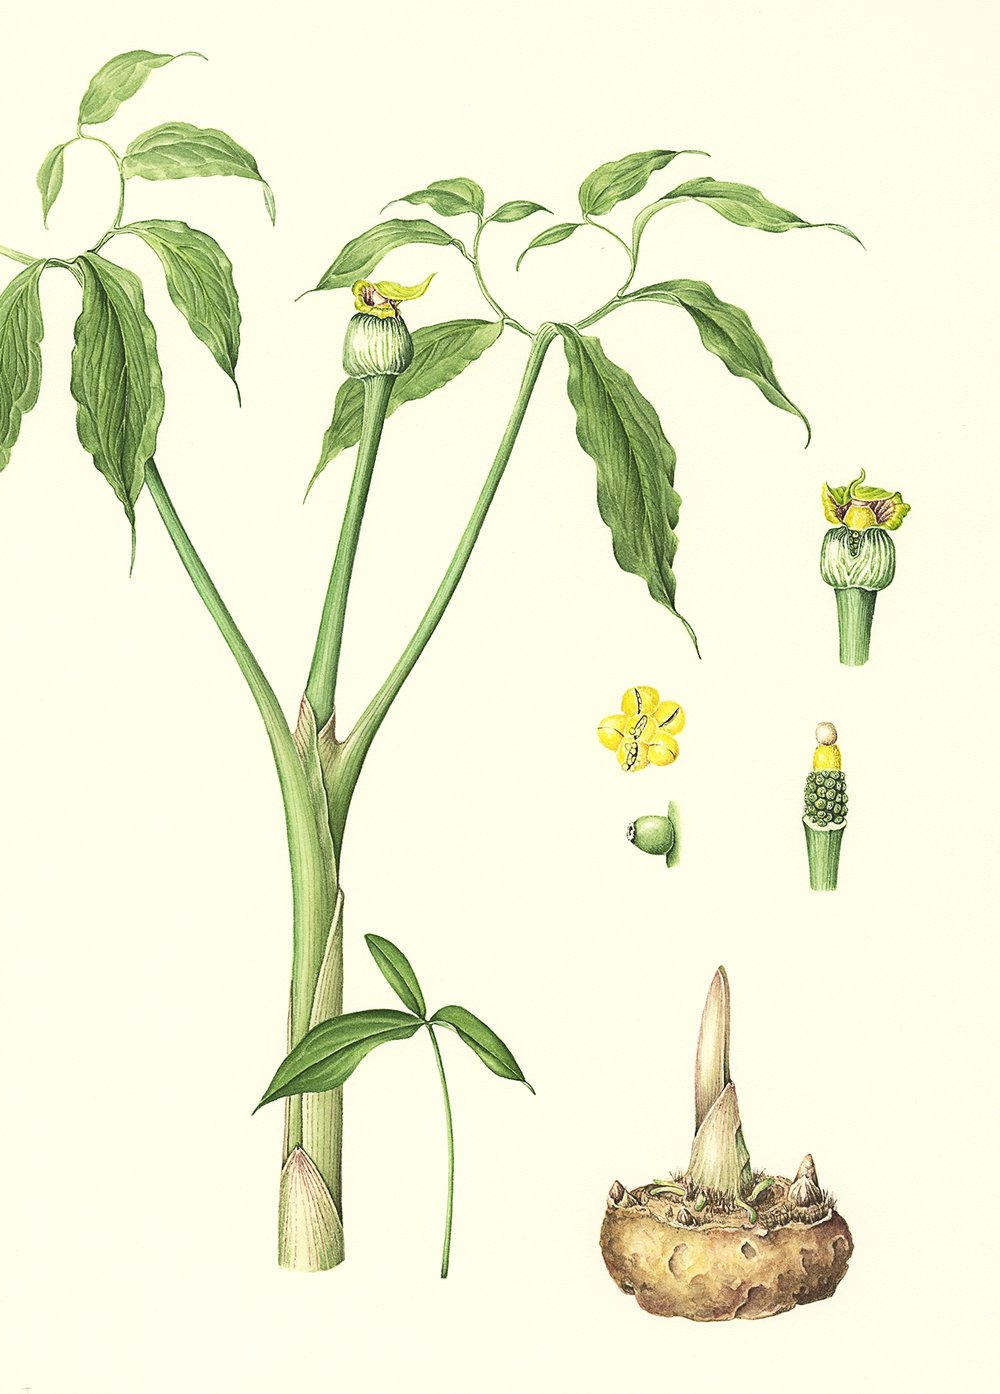 Arisaema flavum